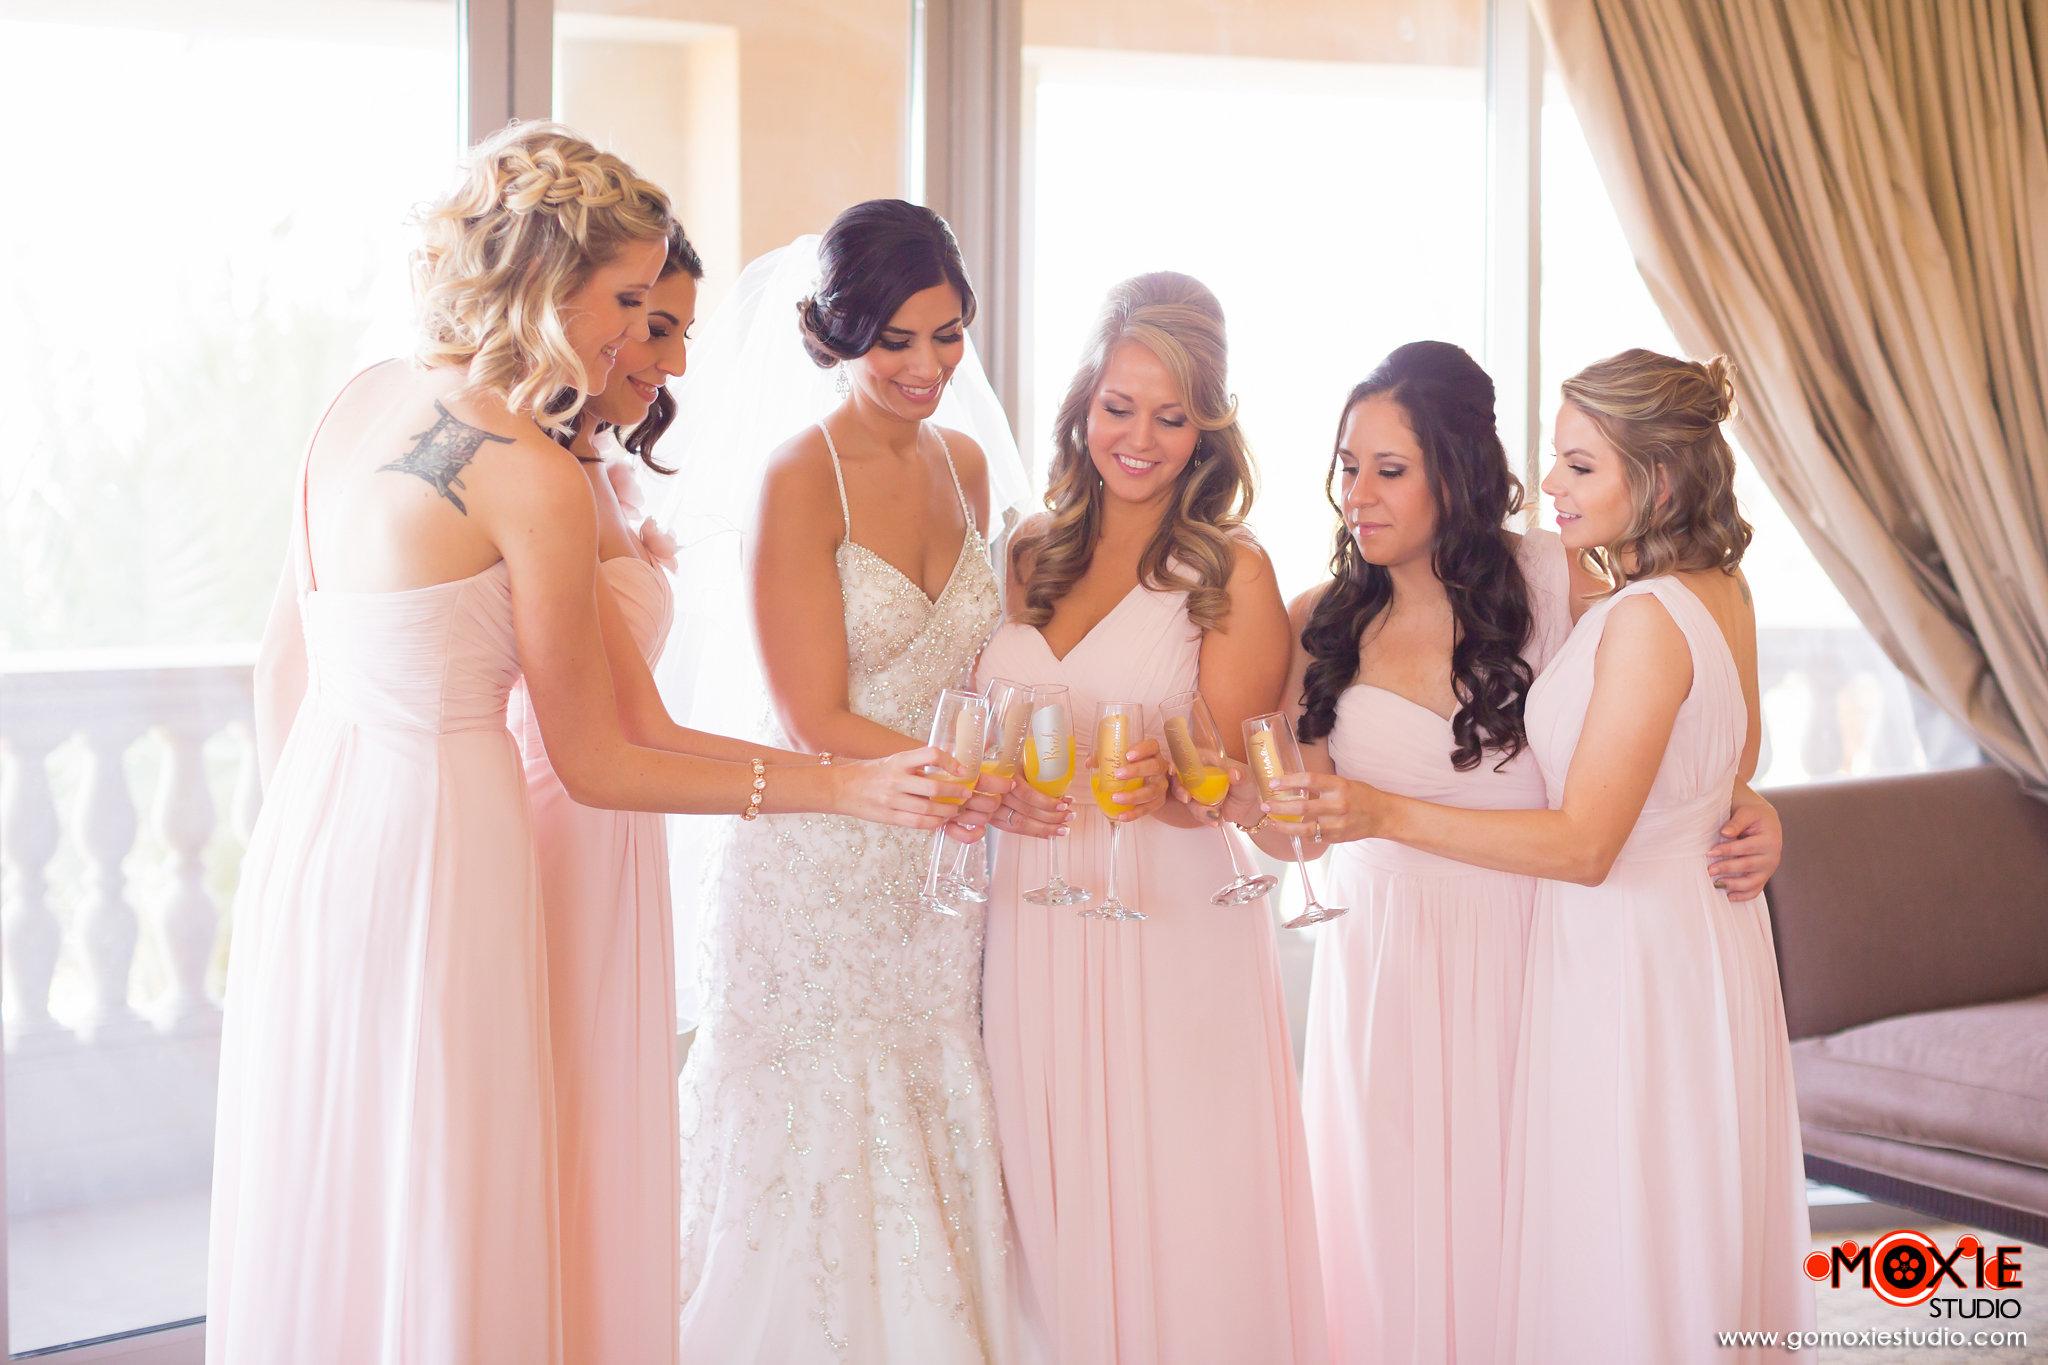 Bridal Party Hair and Makeup Las Vegas